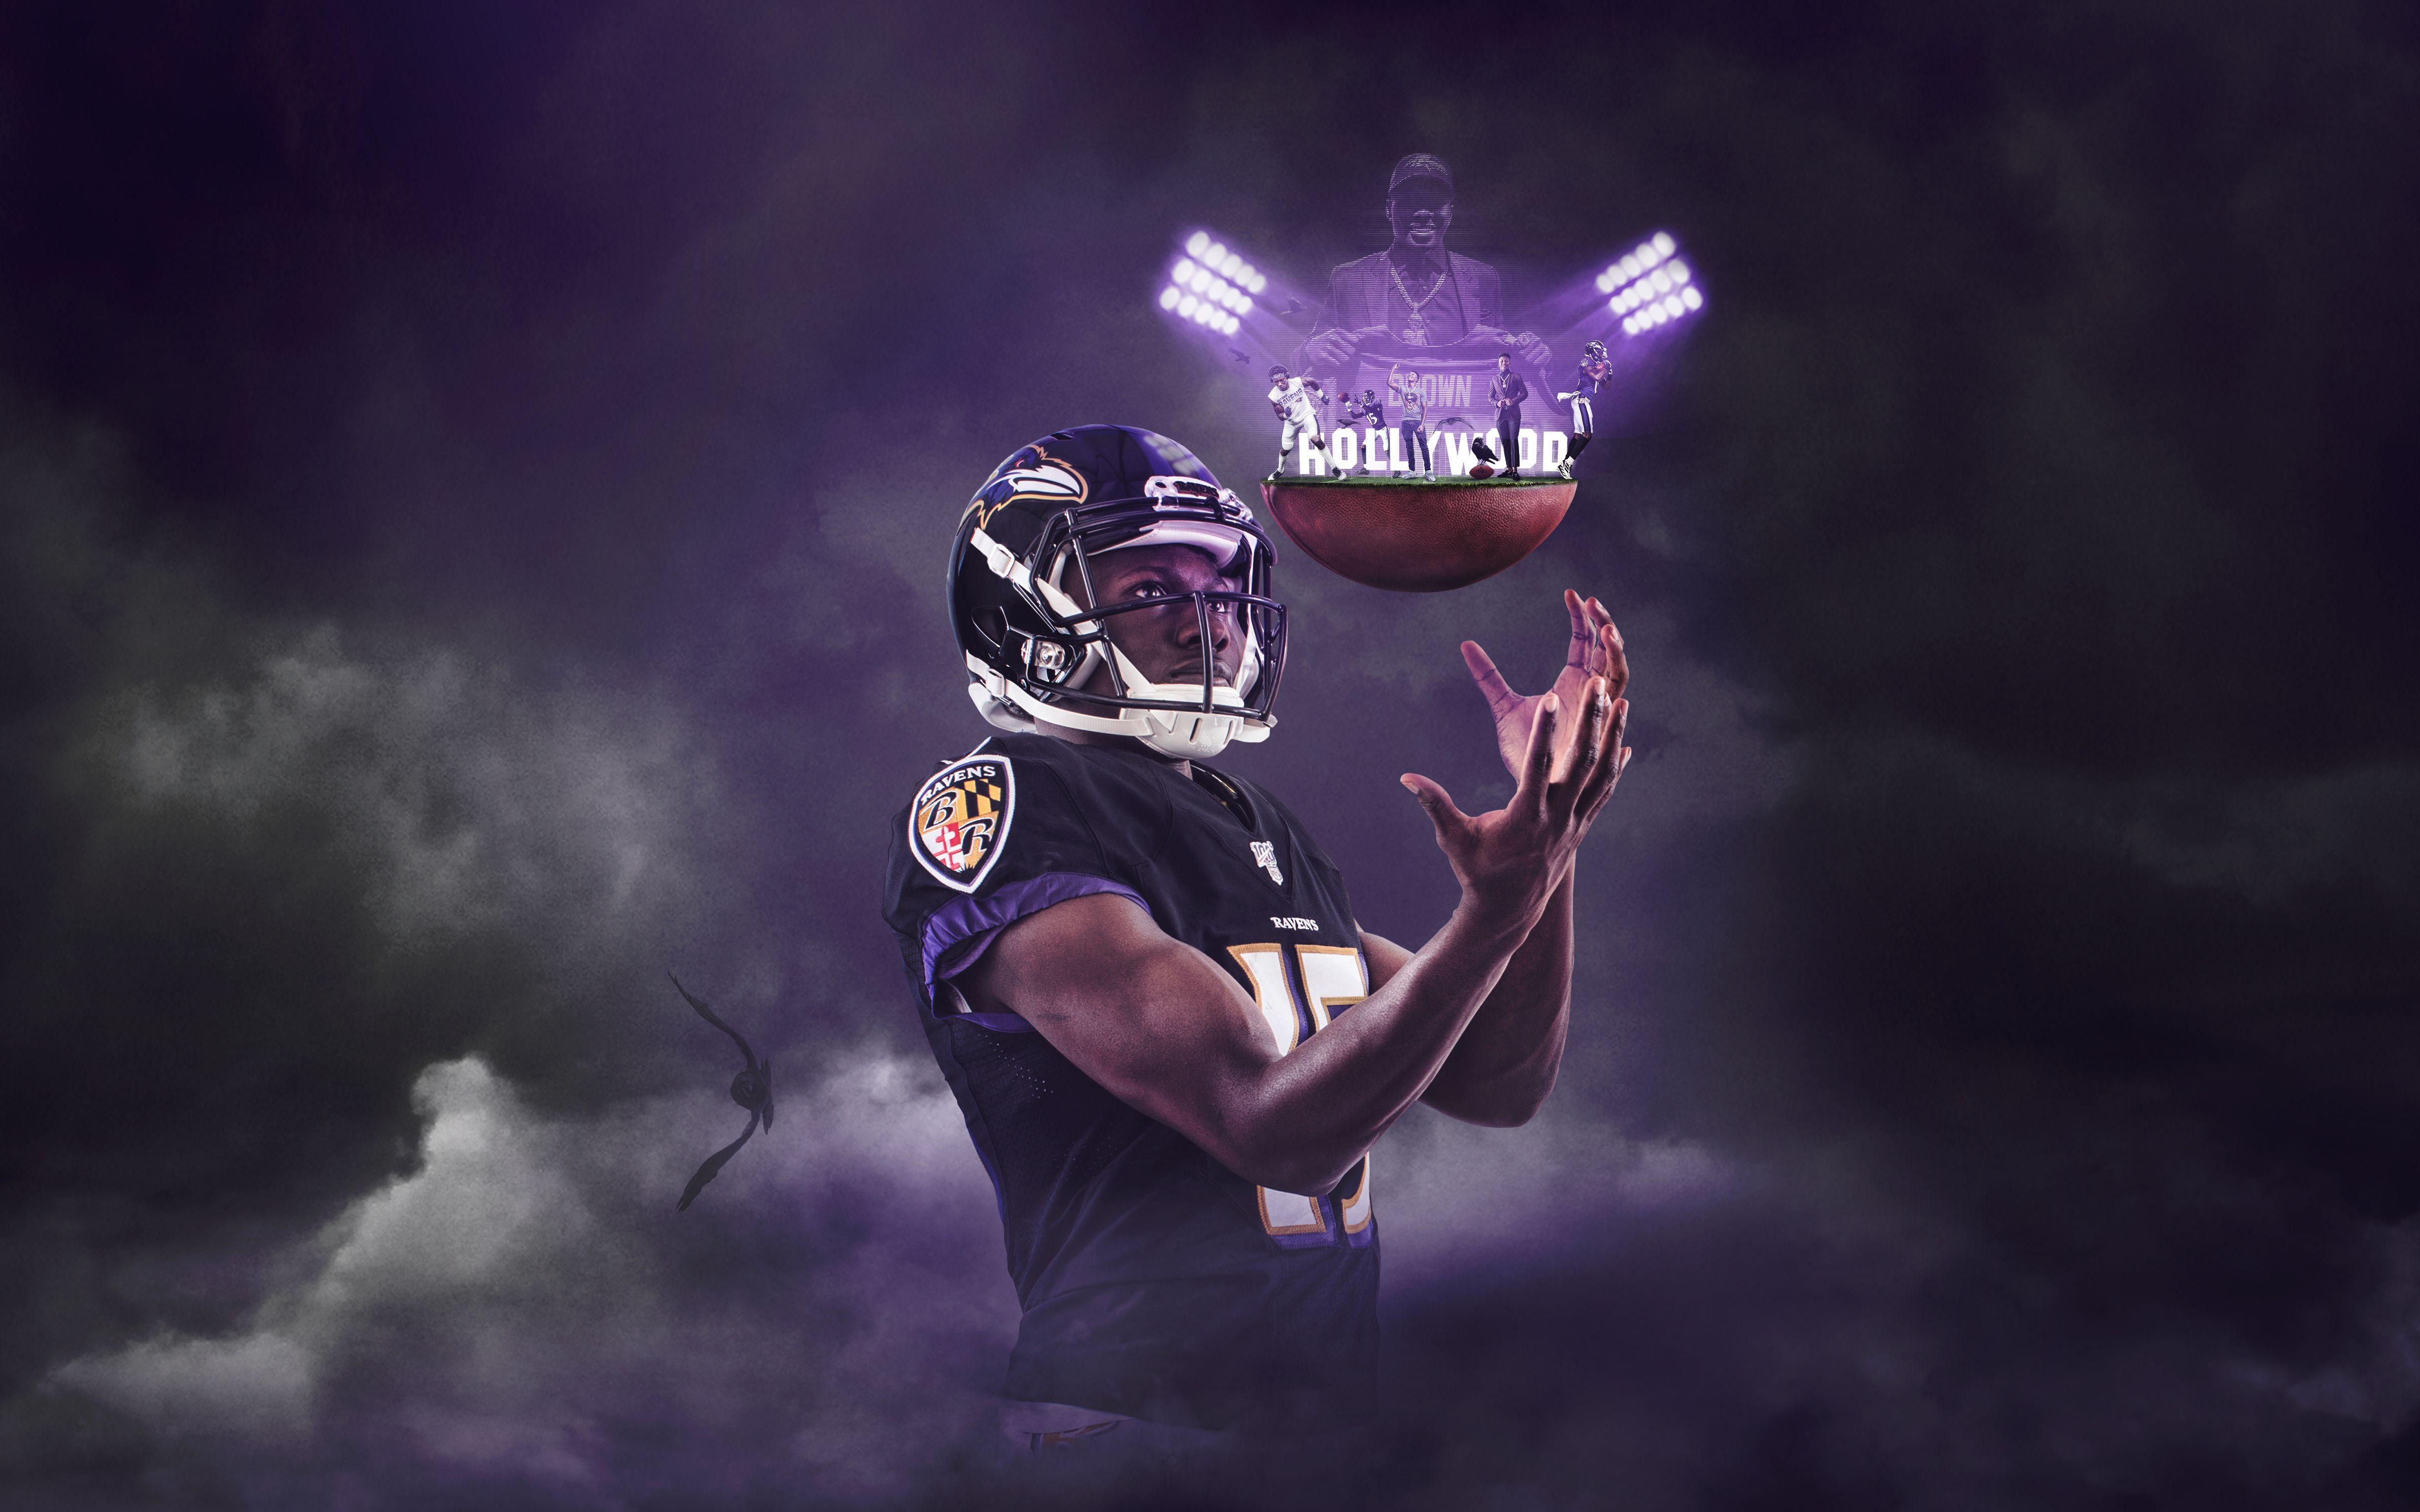 Watch NFL Baltimore Ravens vs Cincinnati Bengals Live